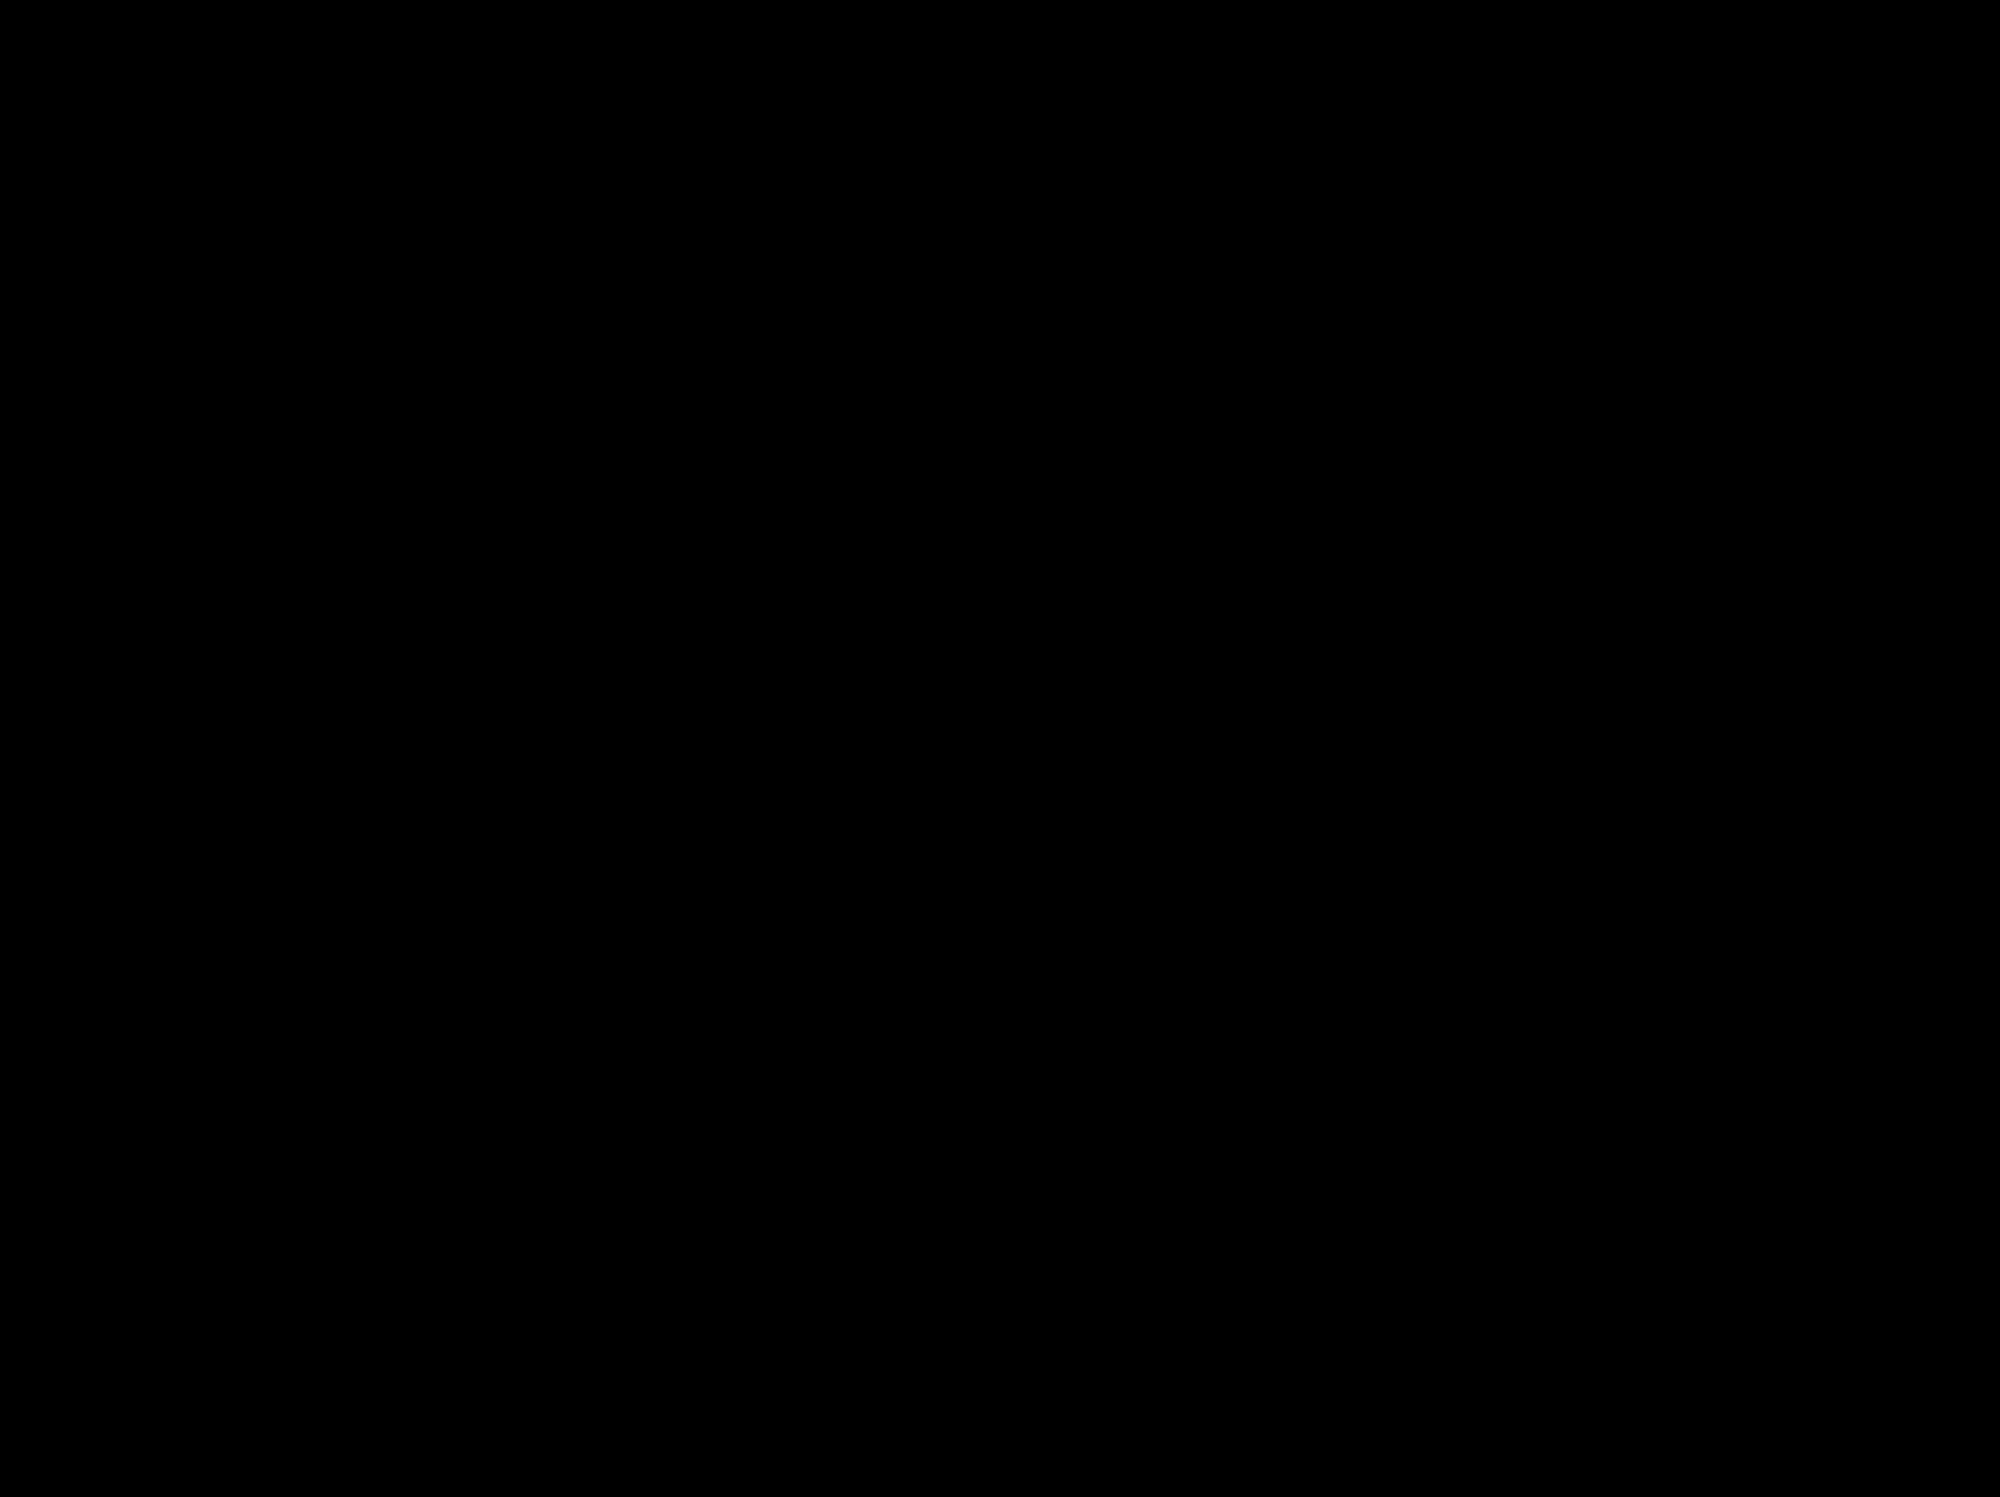 Datei Organon Modell Svg Version Svg Wikipedia